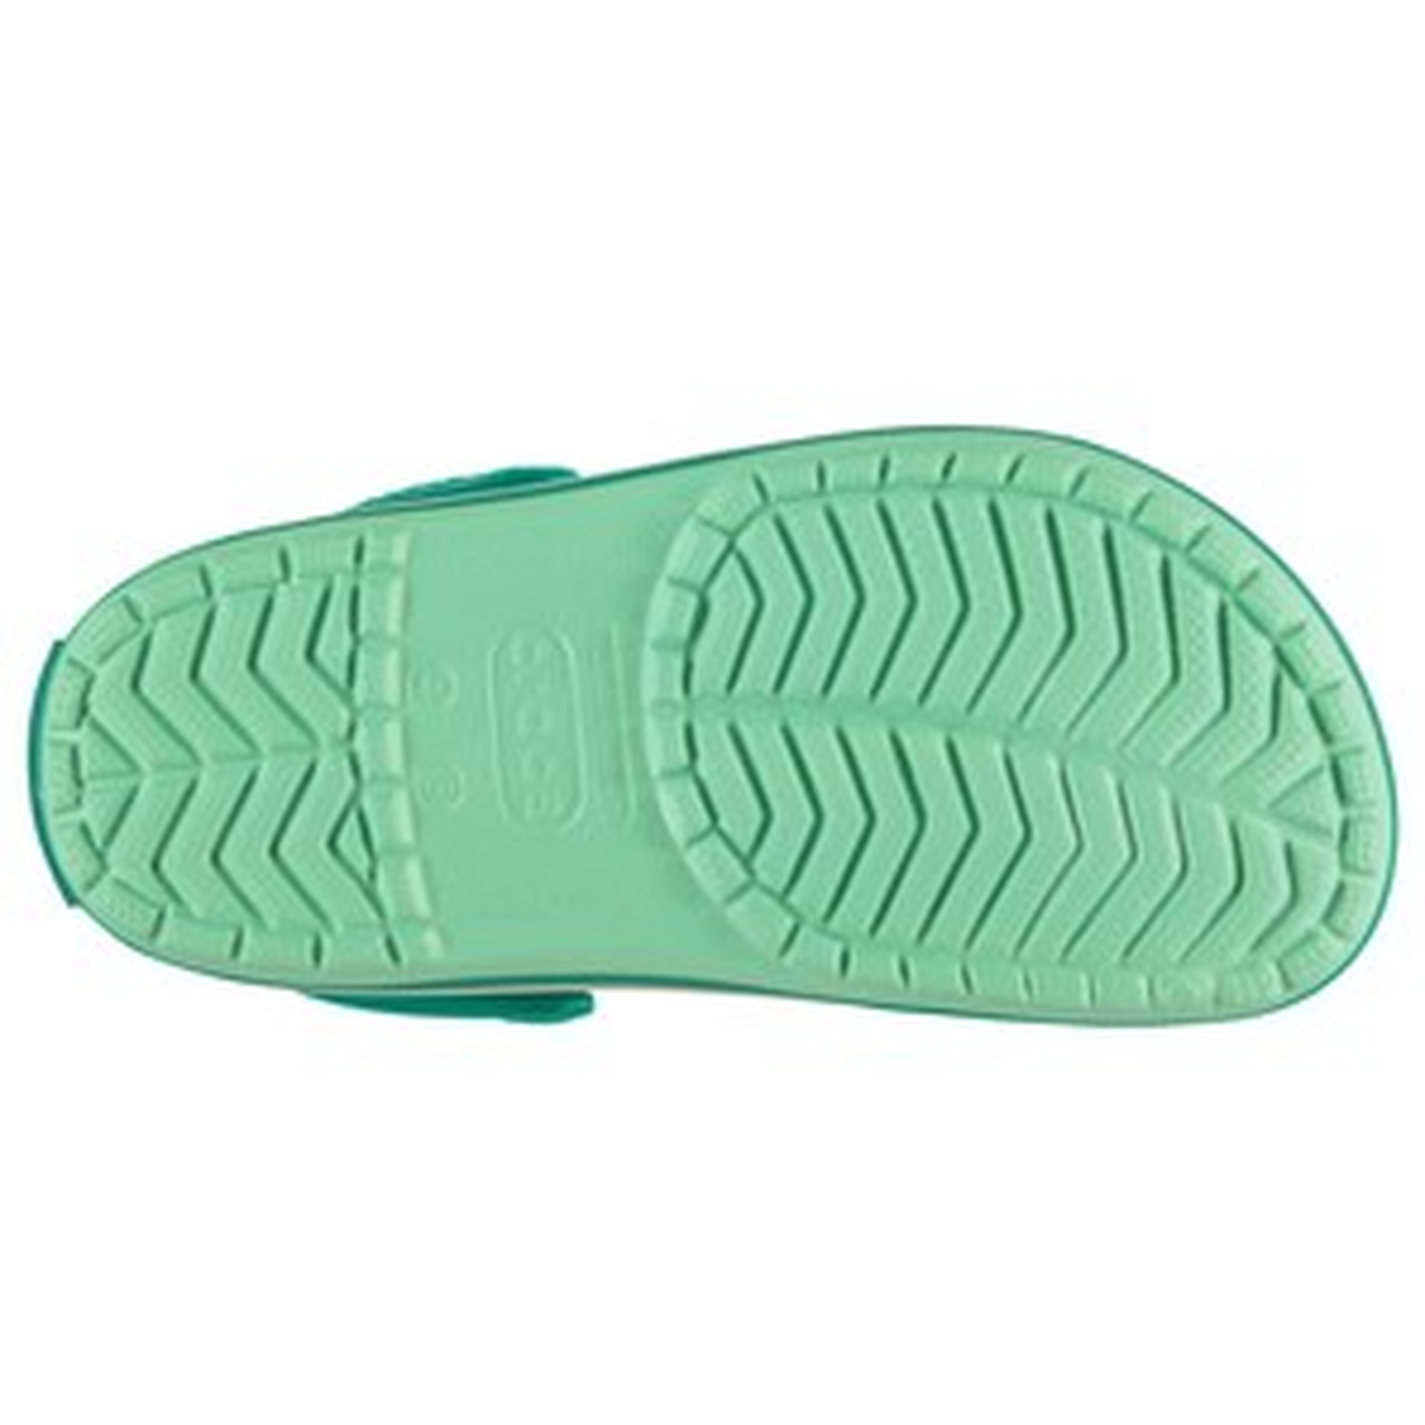 Women's clogs Crocs Crocband